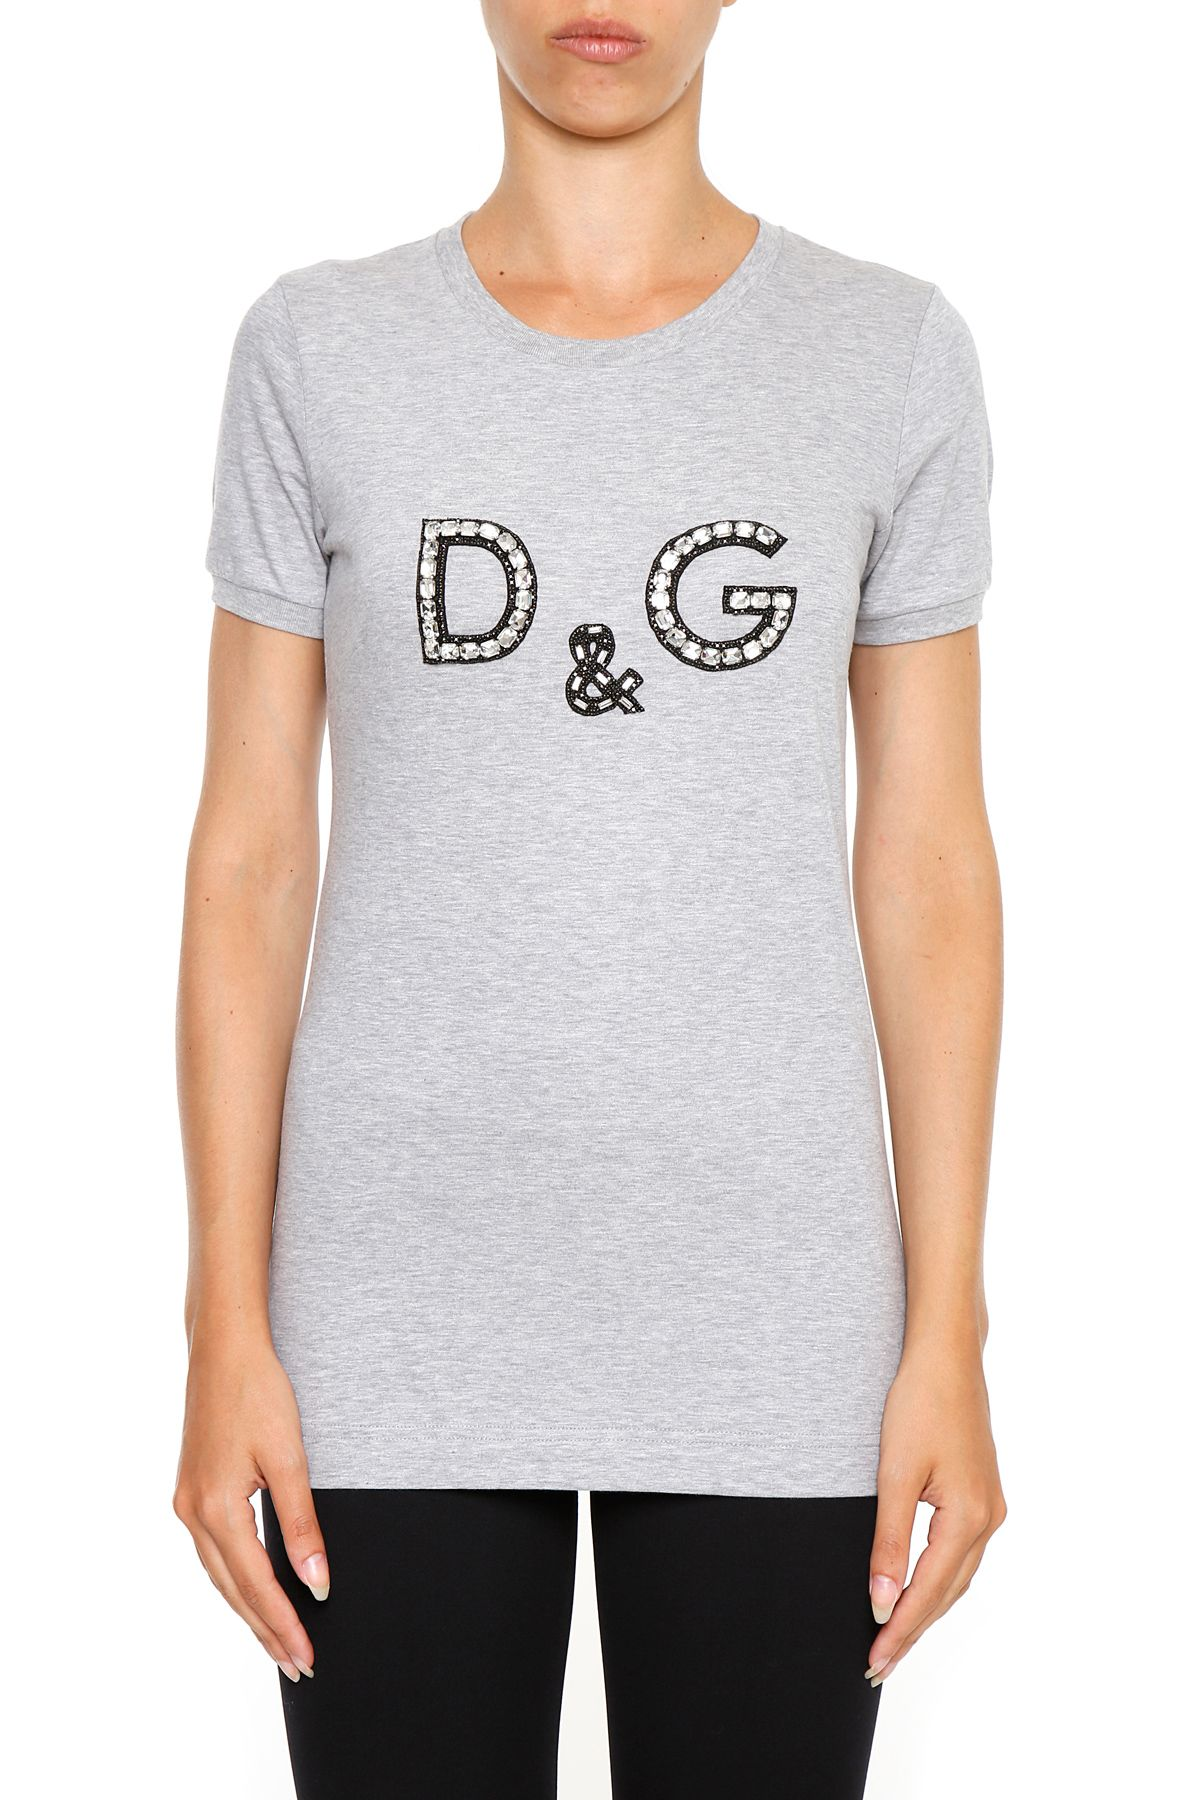 Dolce gabbana logo t shirt melange grigio grigio for Dolce gabbana t shirt women